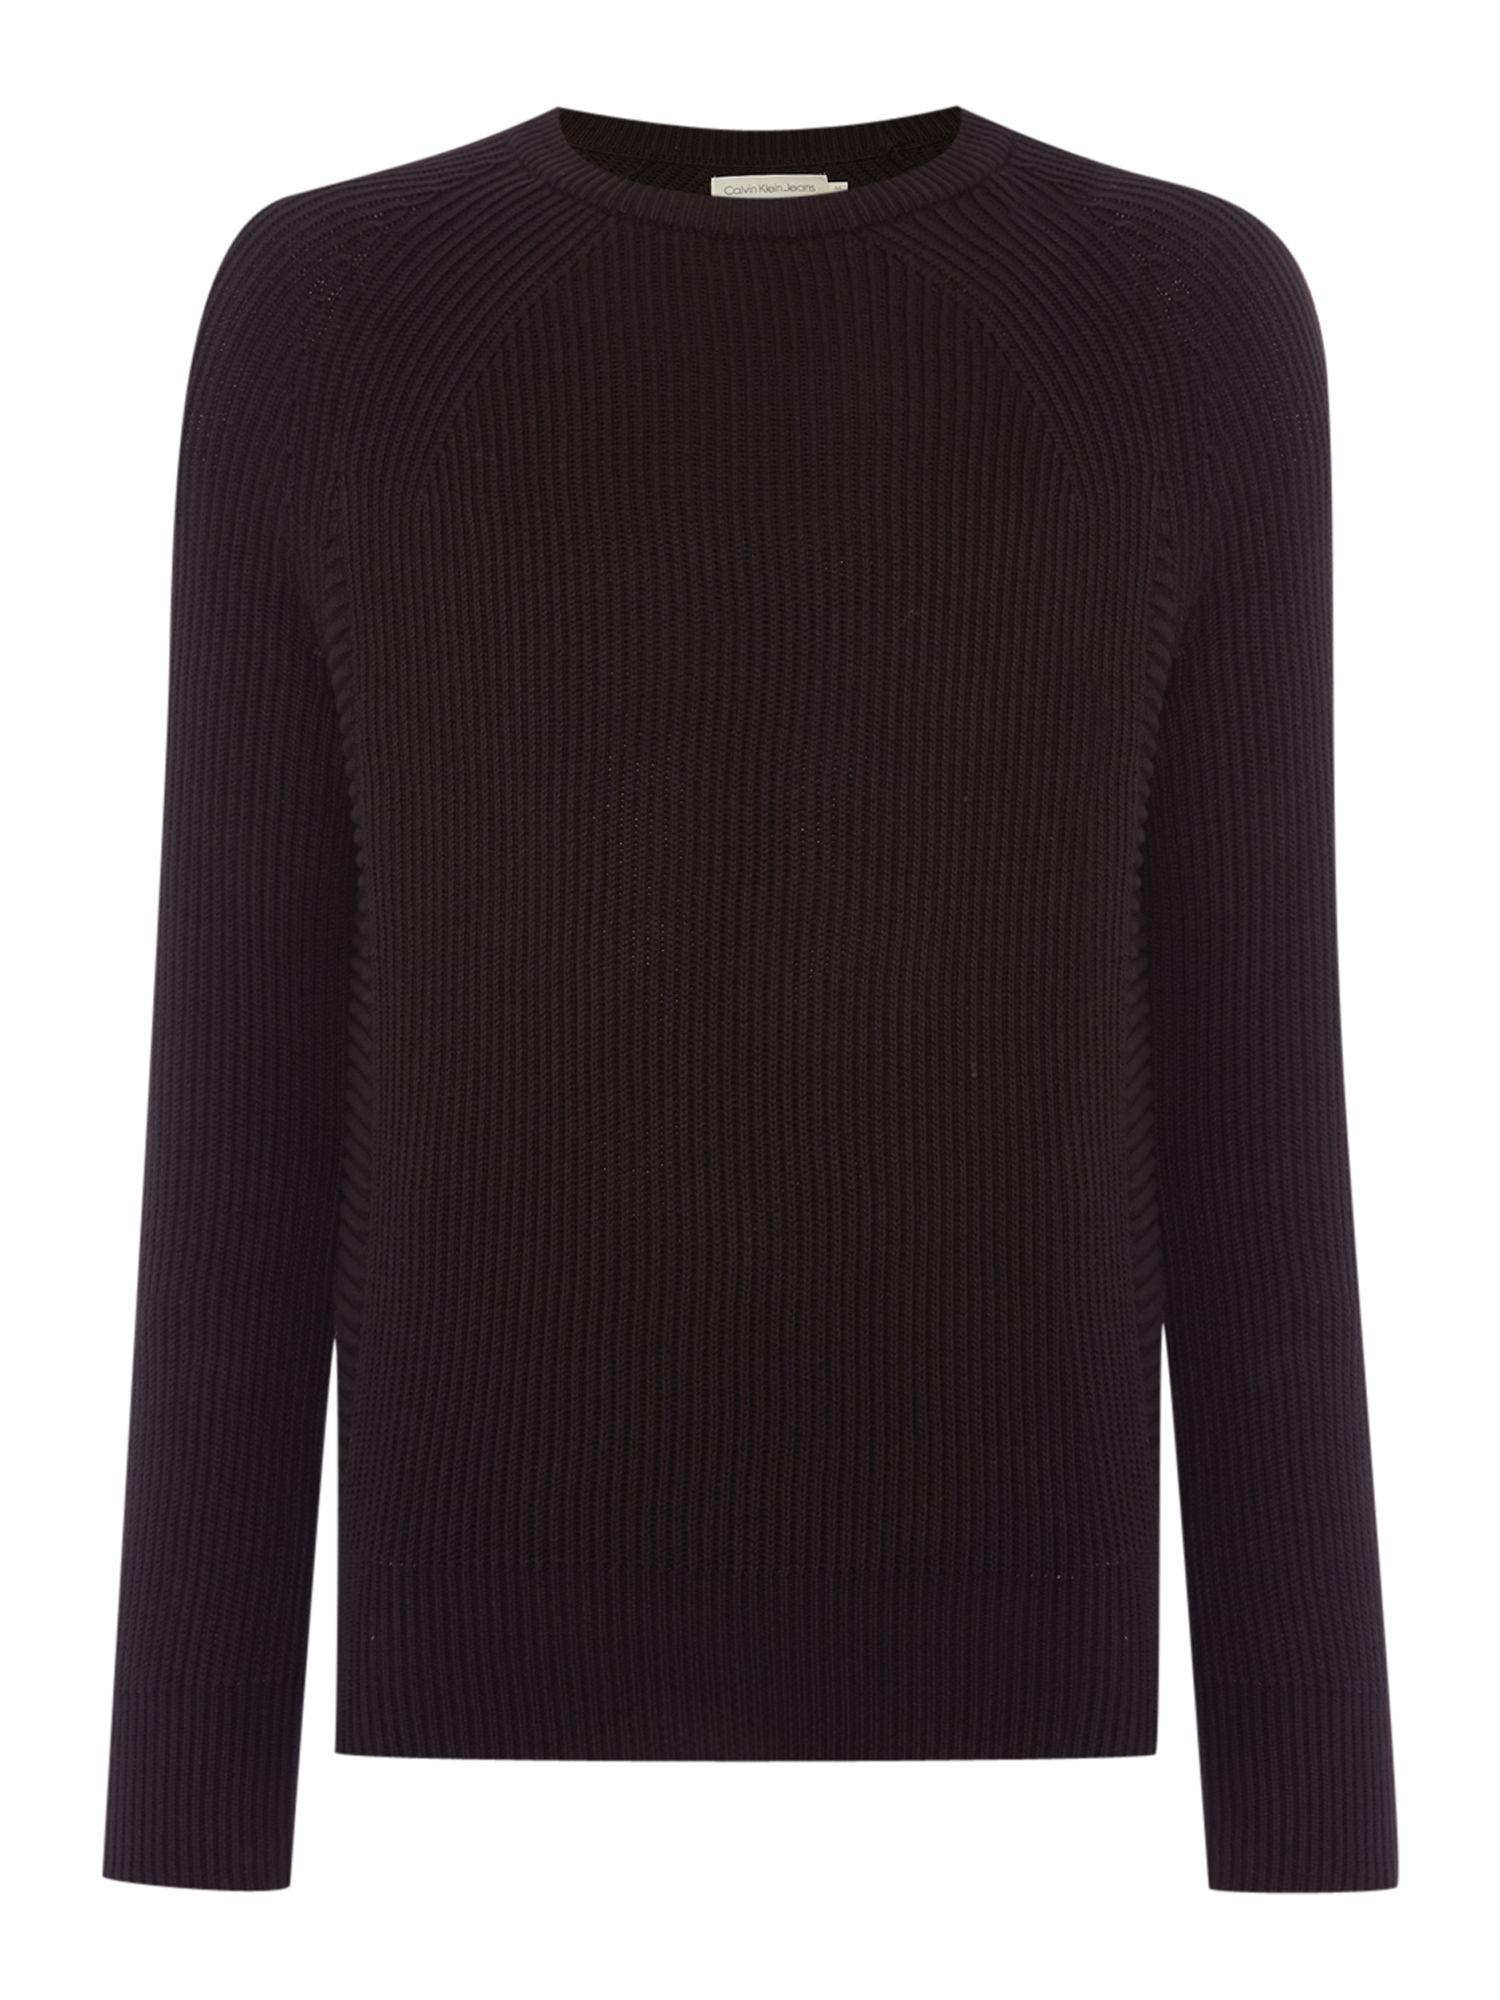 calvin klein carson crew neck long sleeve sweater in black. Black Bedroom Furniture Sets. Home Design Ideas